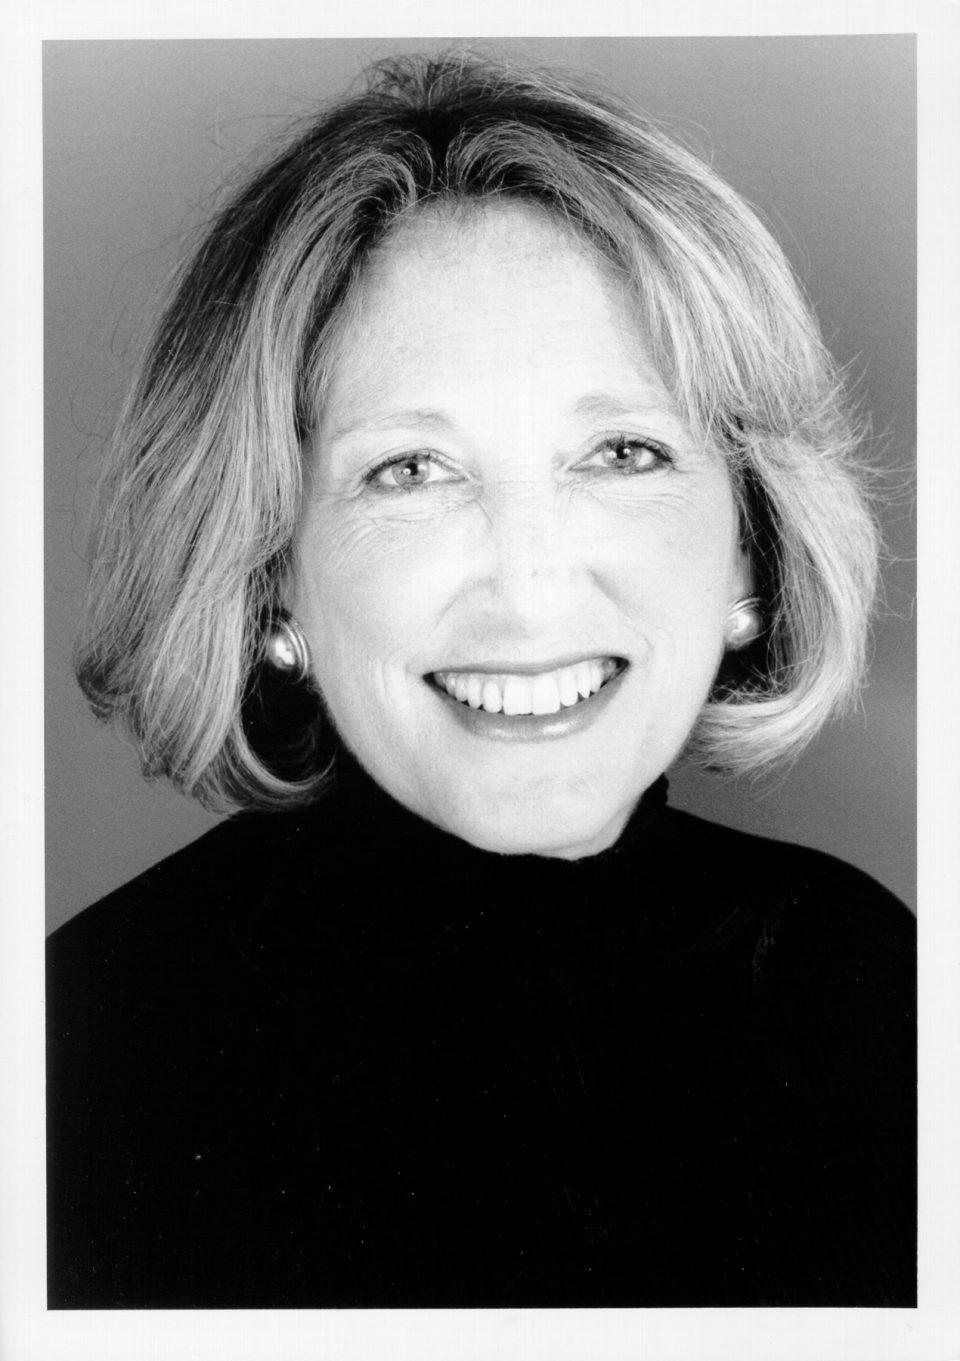 Susan A. Maxman, portrait, circa 2000. SMP Architects